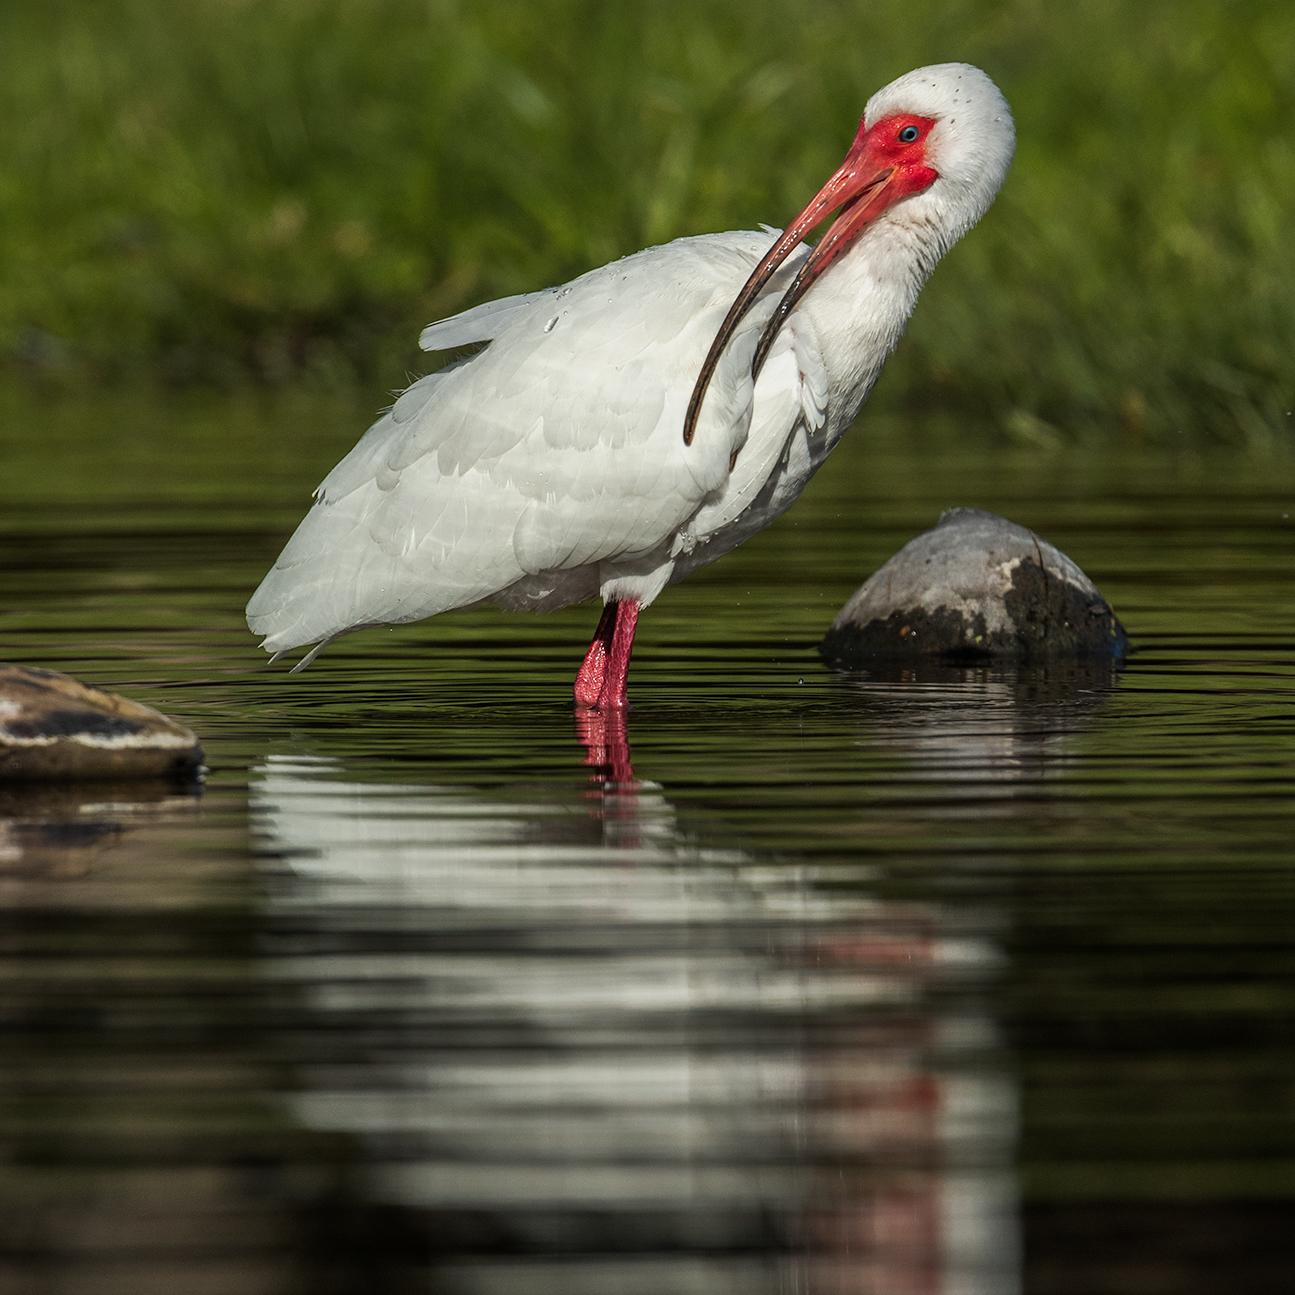 White Ibis preening